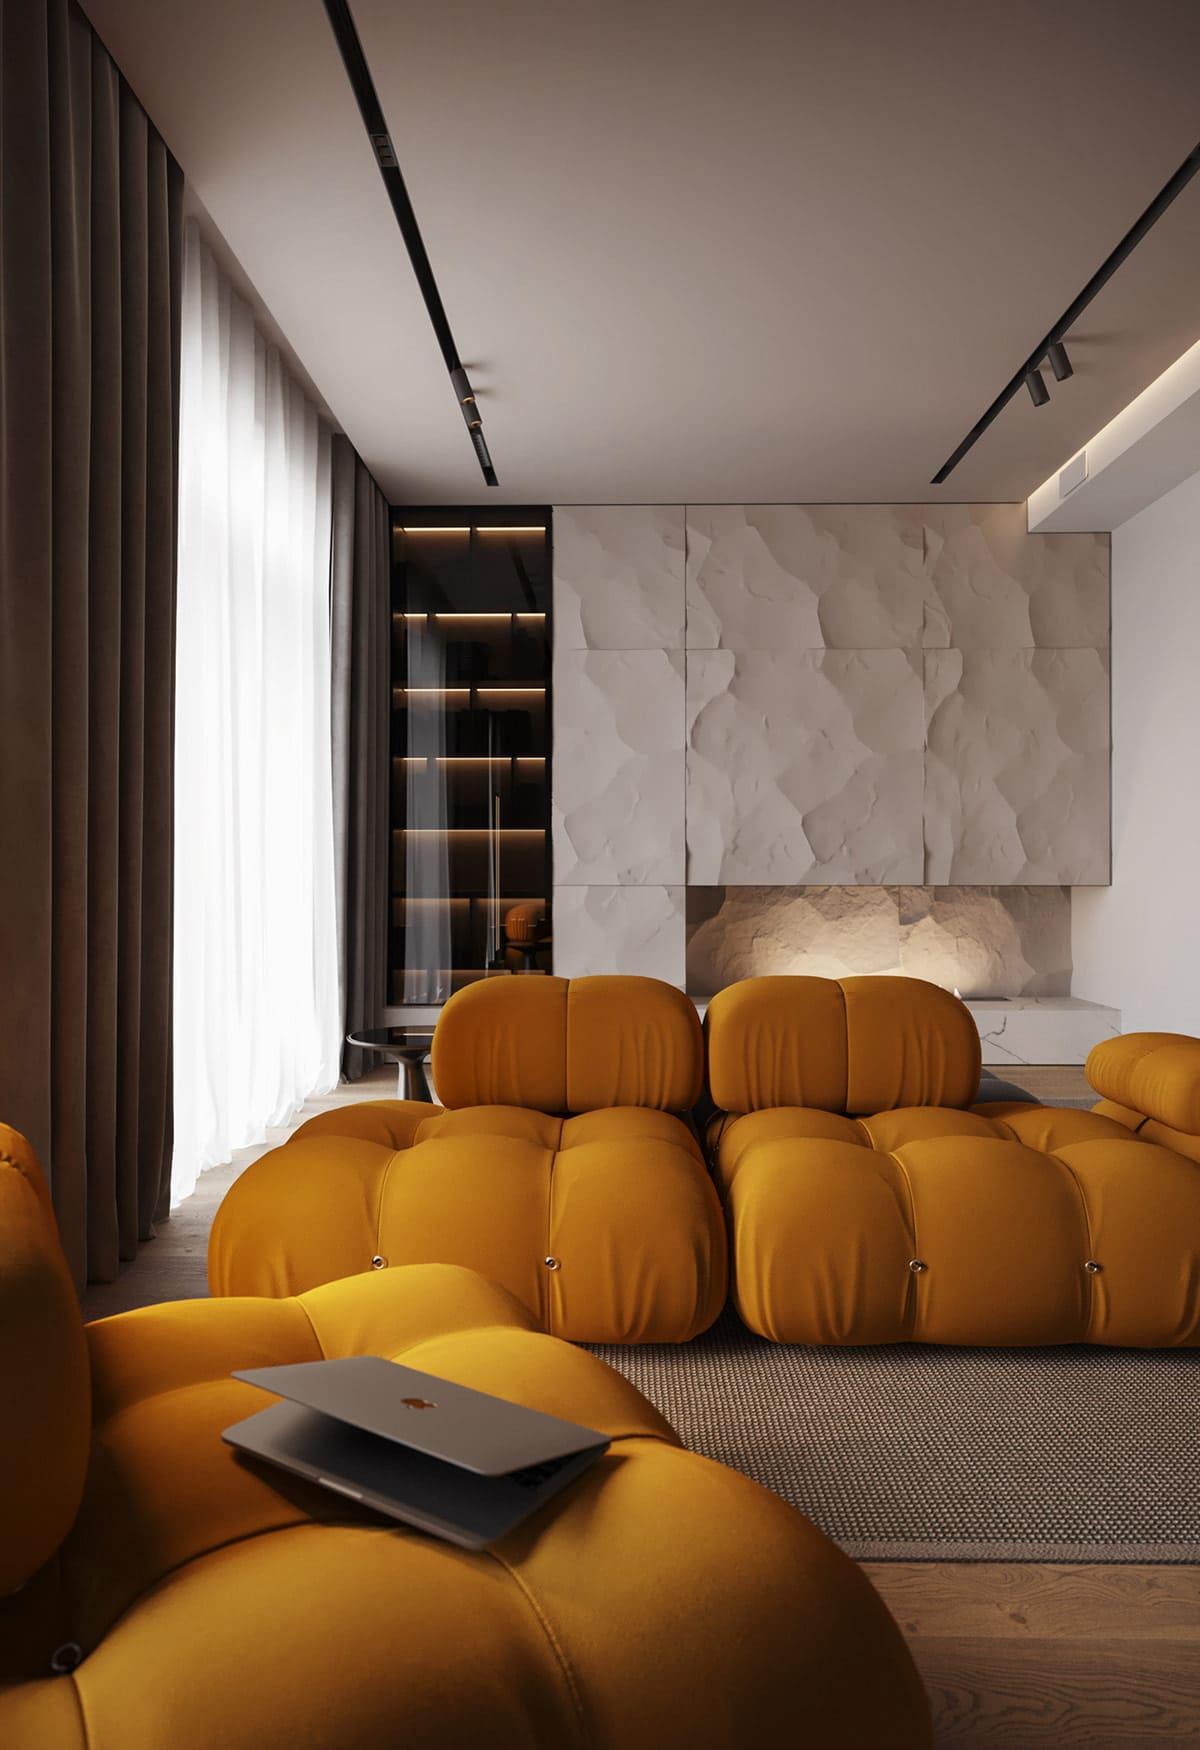 дизайн интерьера модной квартиры фото 1